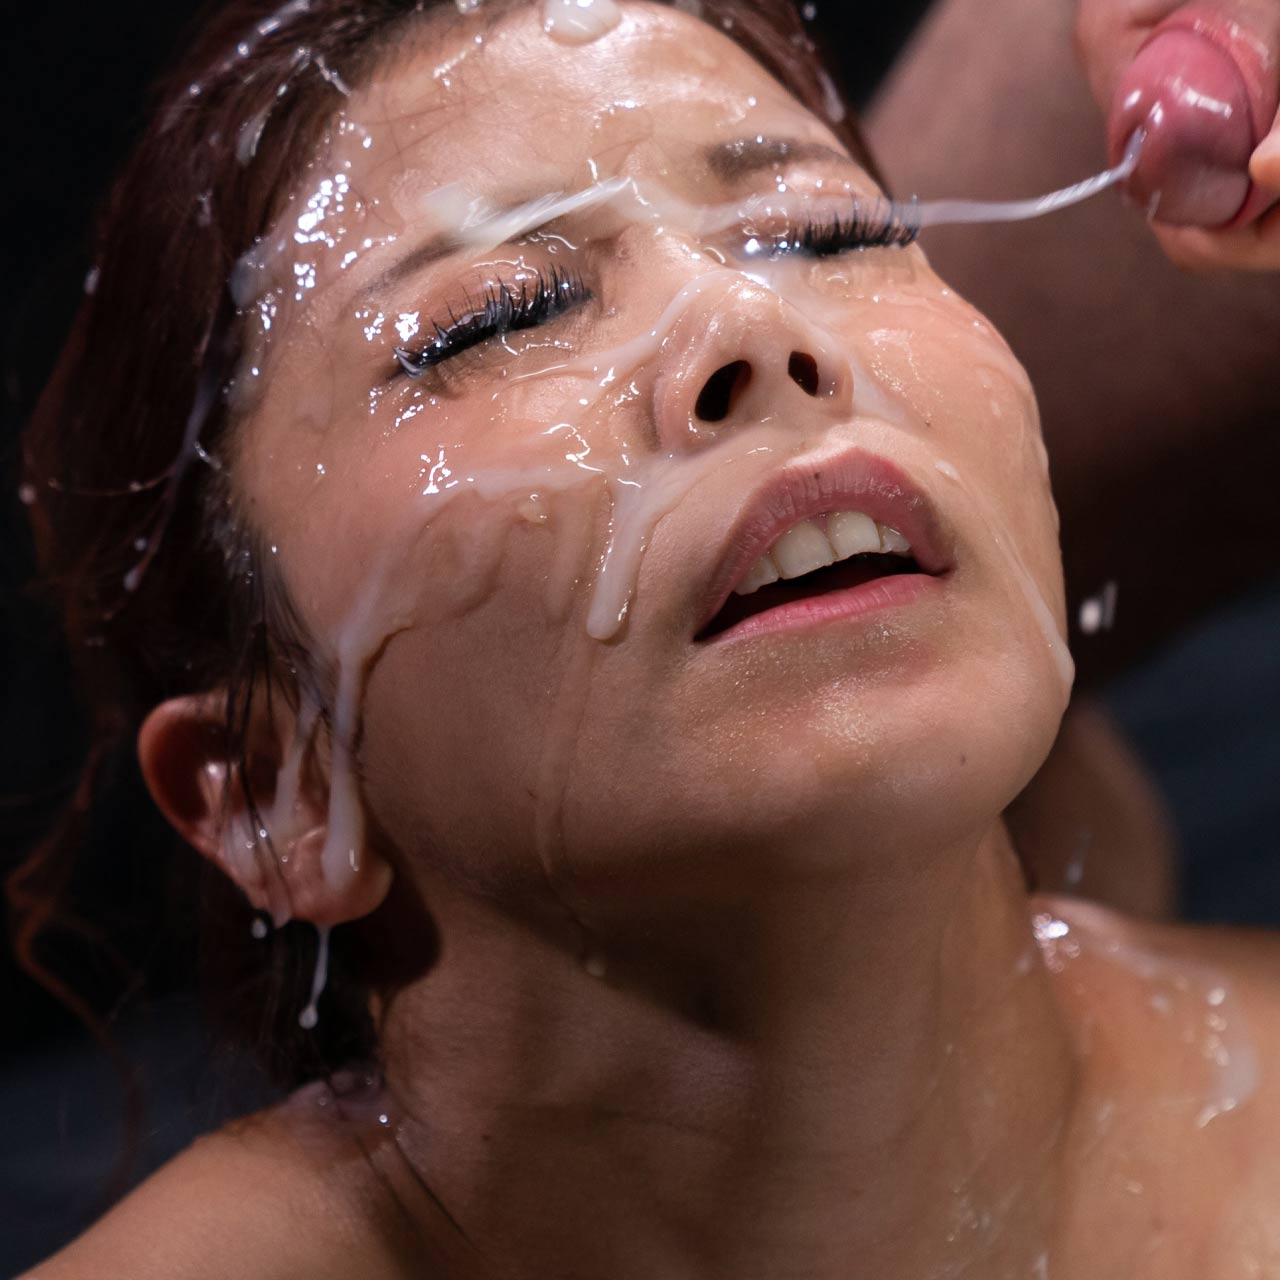 Saki Kawanami nude in a Bukkake Facial Cumshot Fetish video from SpermMania. A nude Japanese girl receives 18 facials while fucking and masturbating.